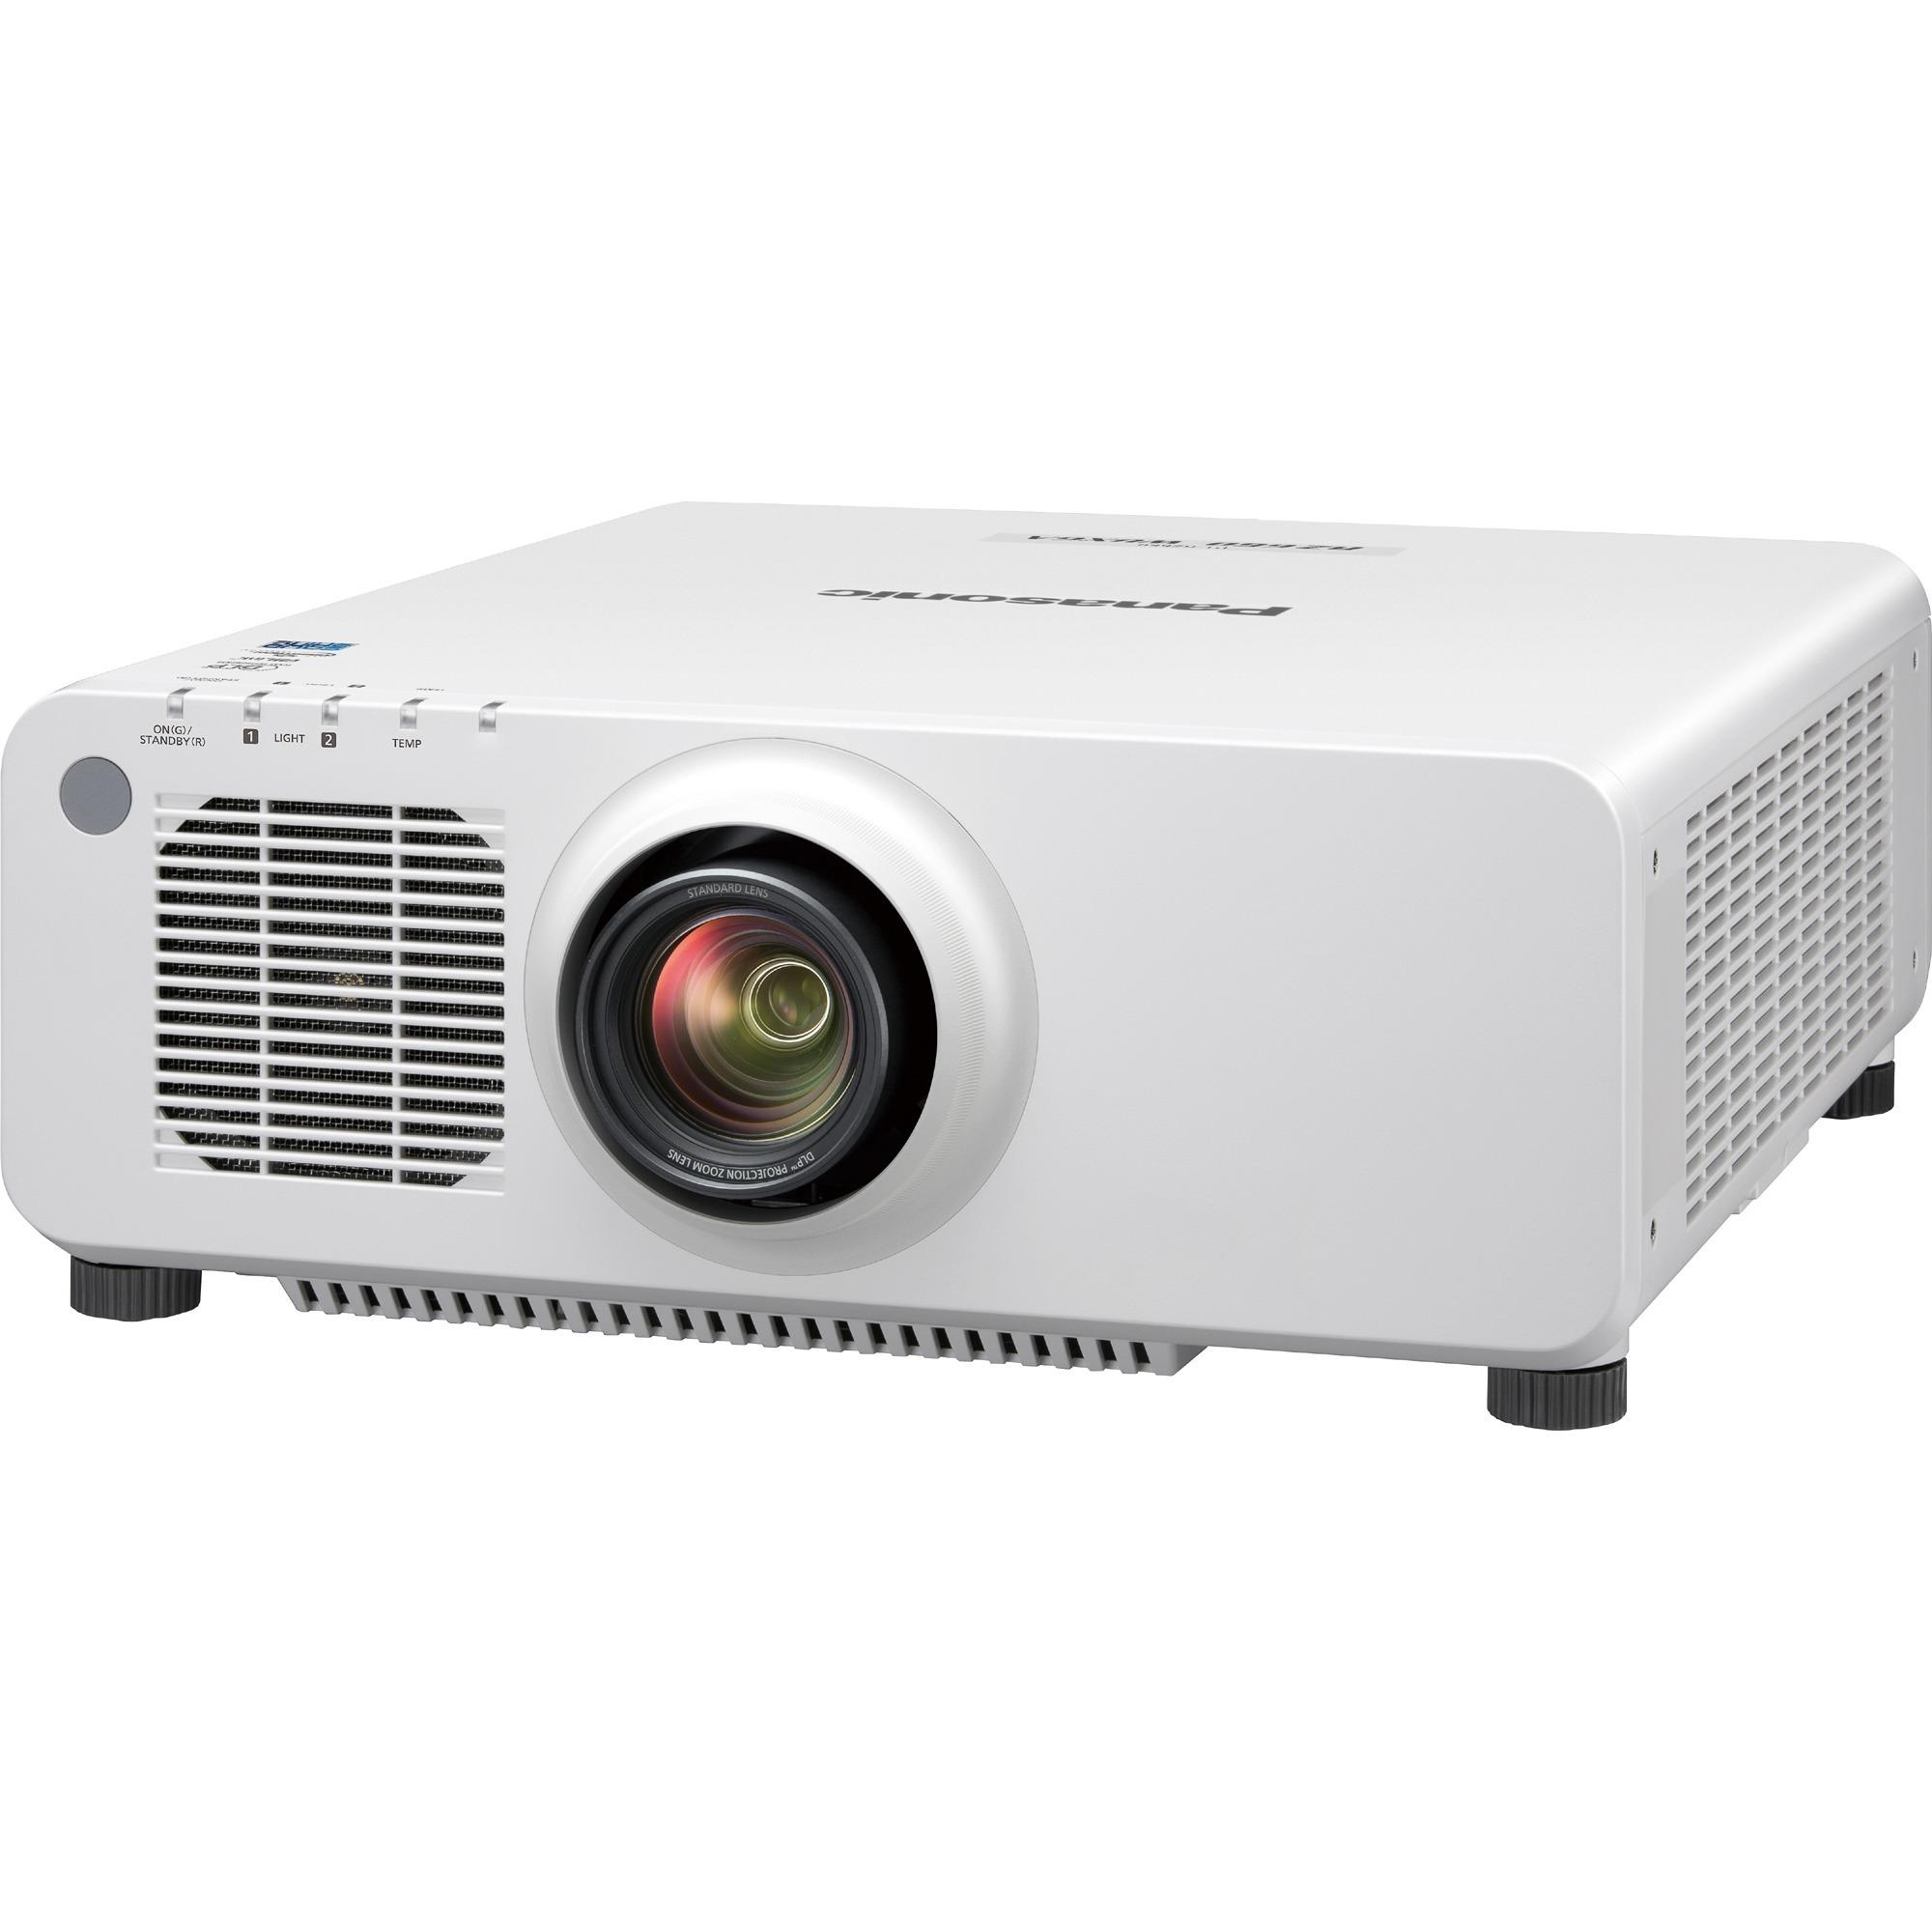 Panasonic SOLID SHINE PT-RZ660 DLP Projector - 16:10 - White_subImage_1